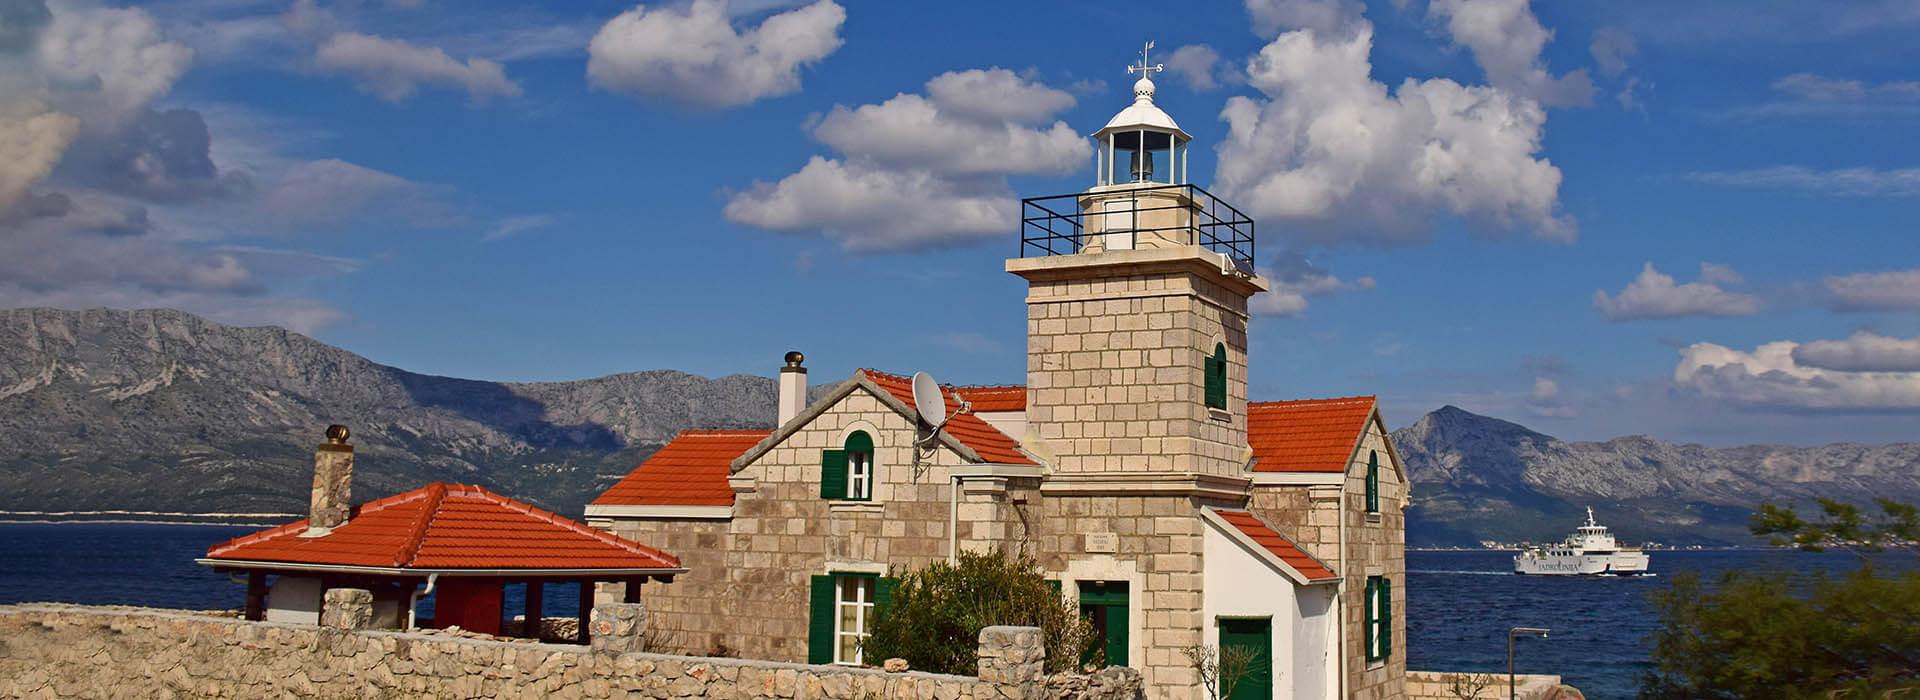 Casa Resort, Sucuraj, Isola di Hvar, Croazia - foto4